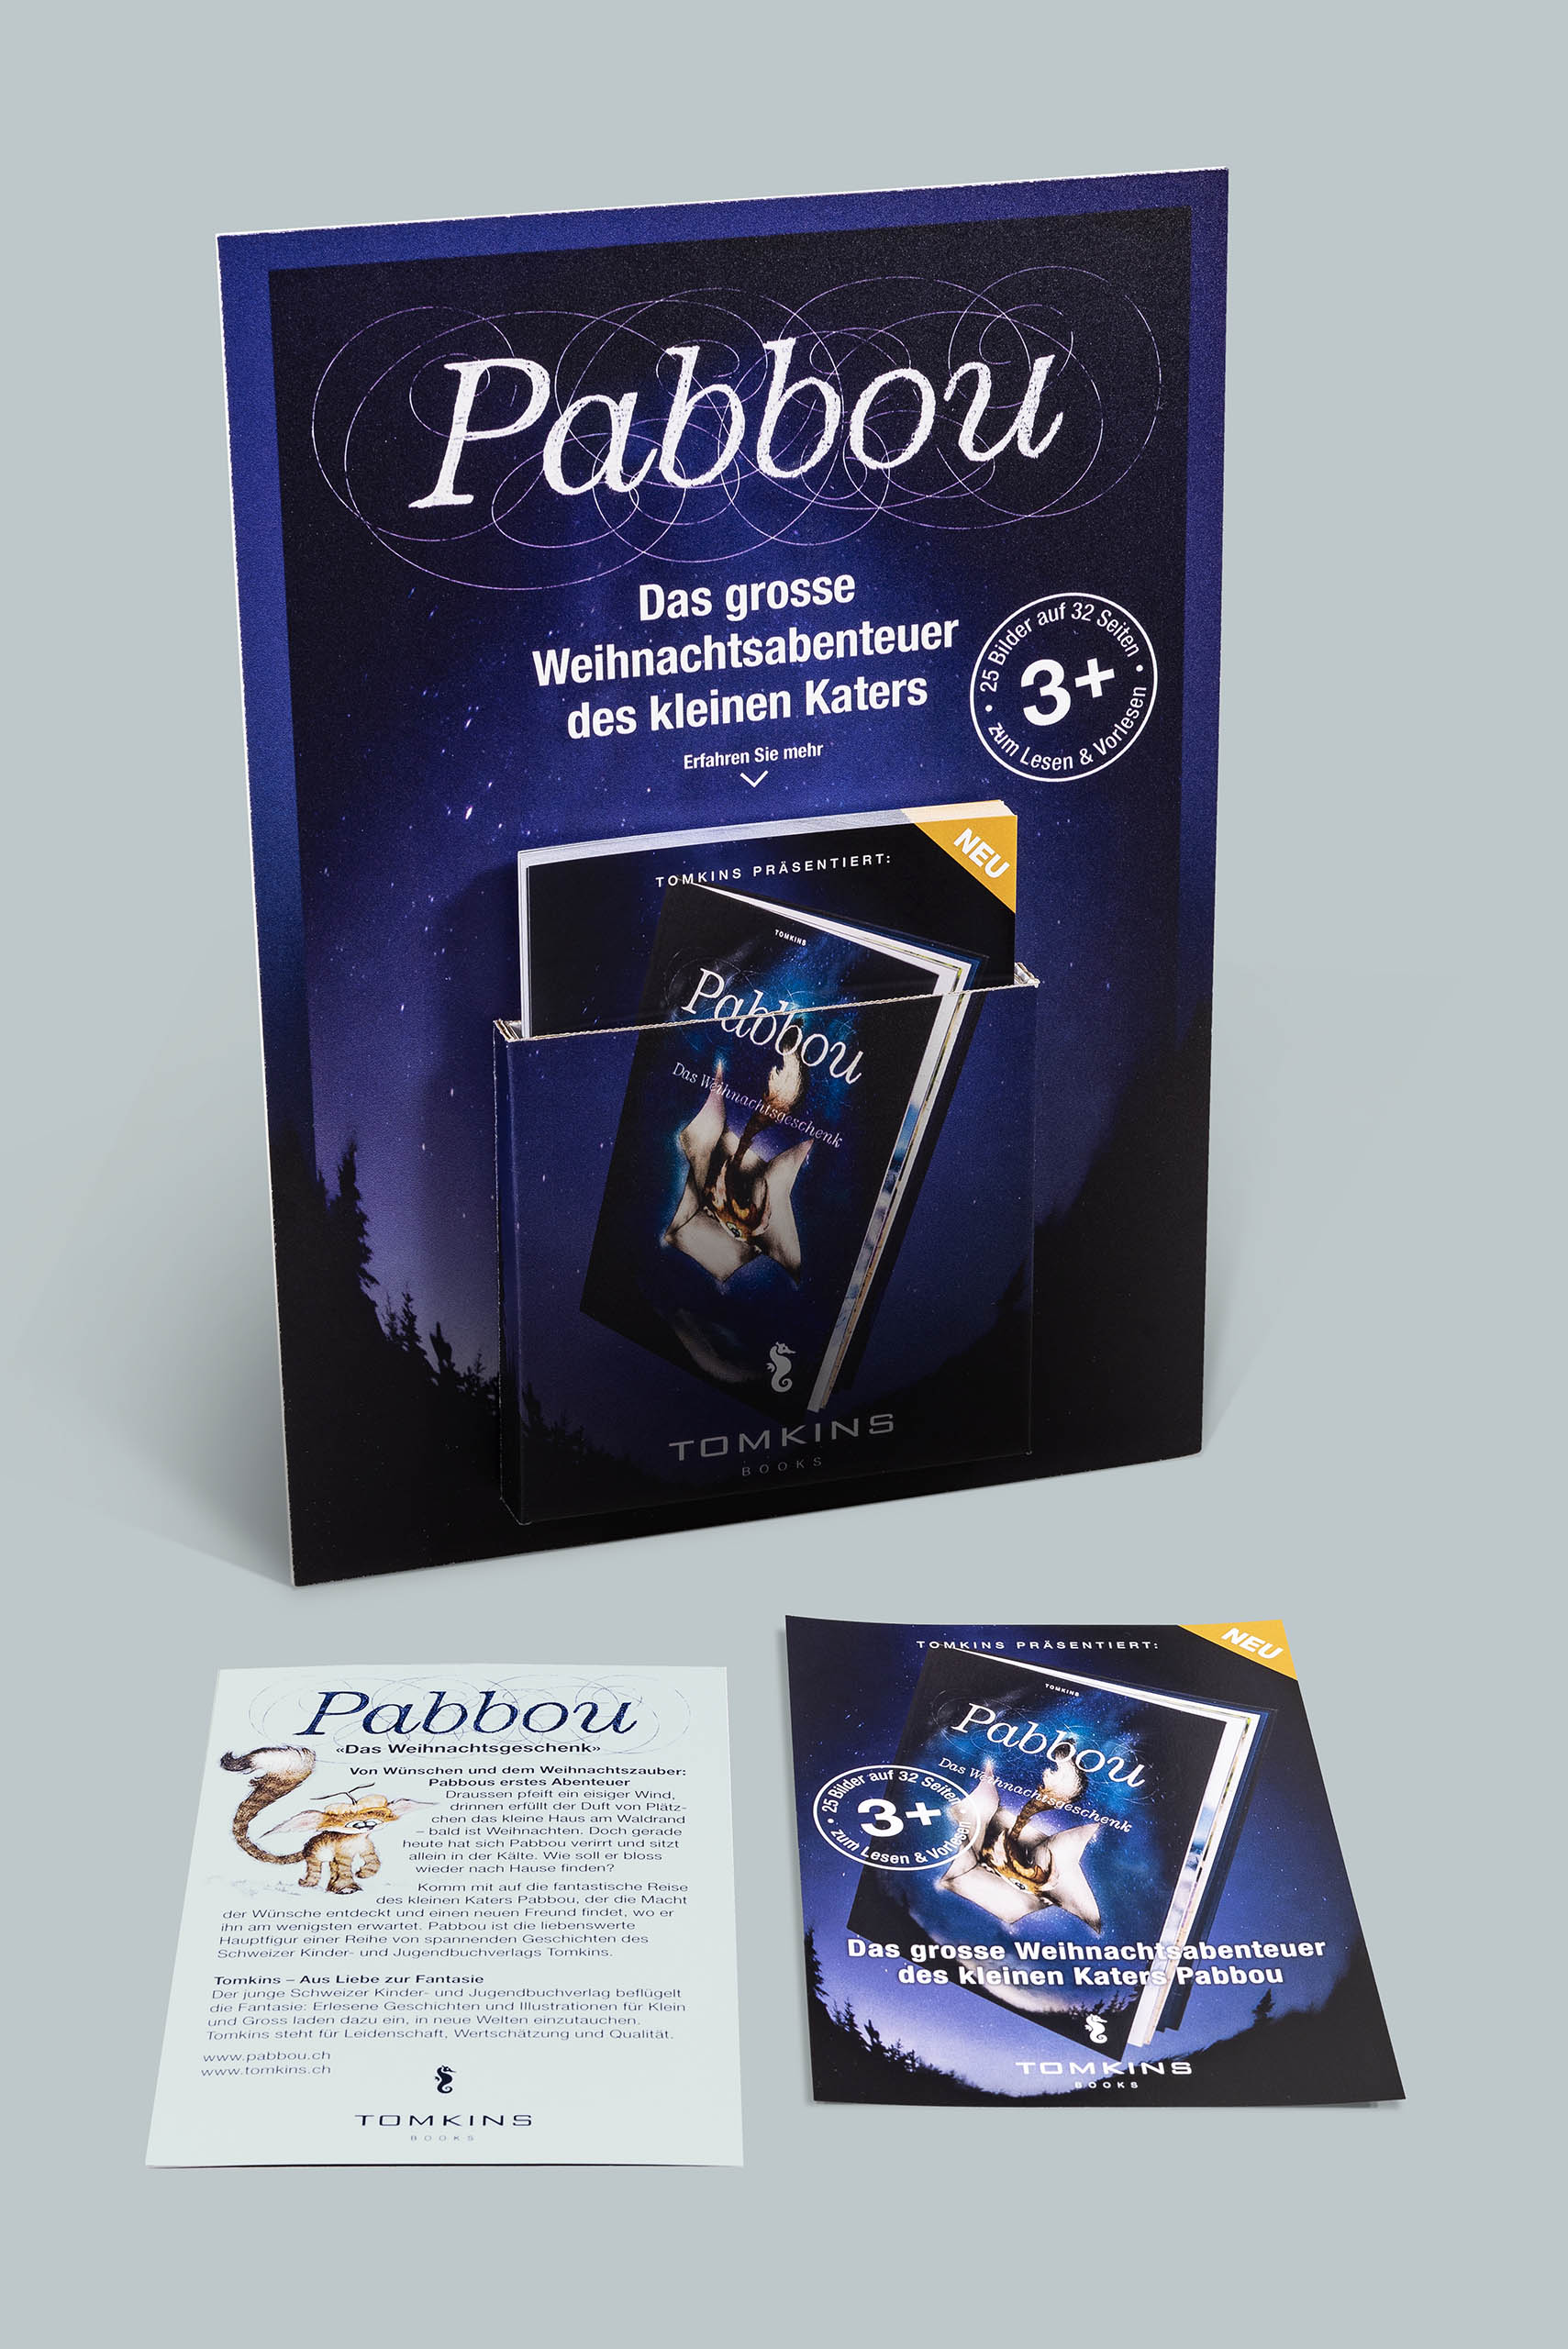 Pabbou_Thekendisplay-Dispenser